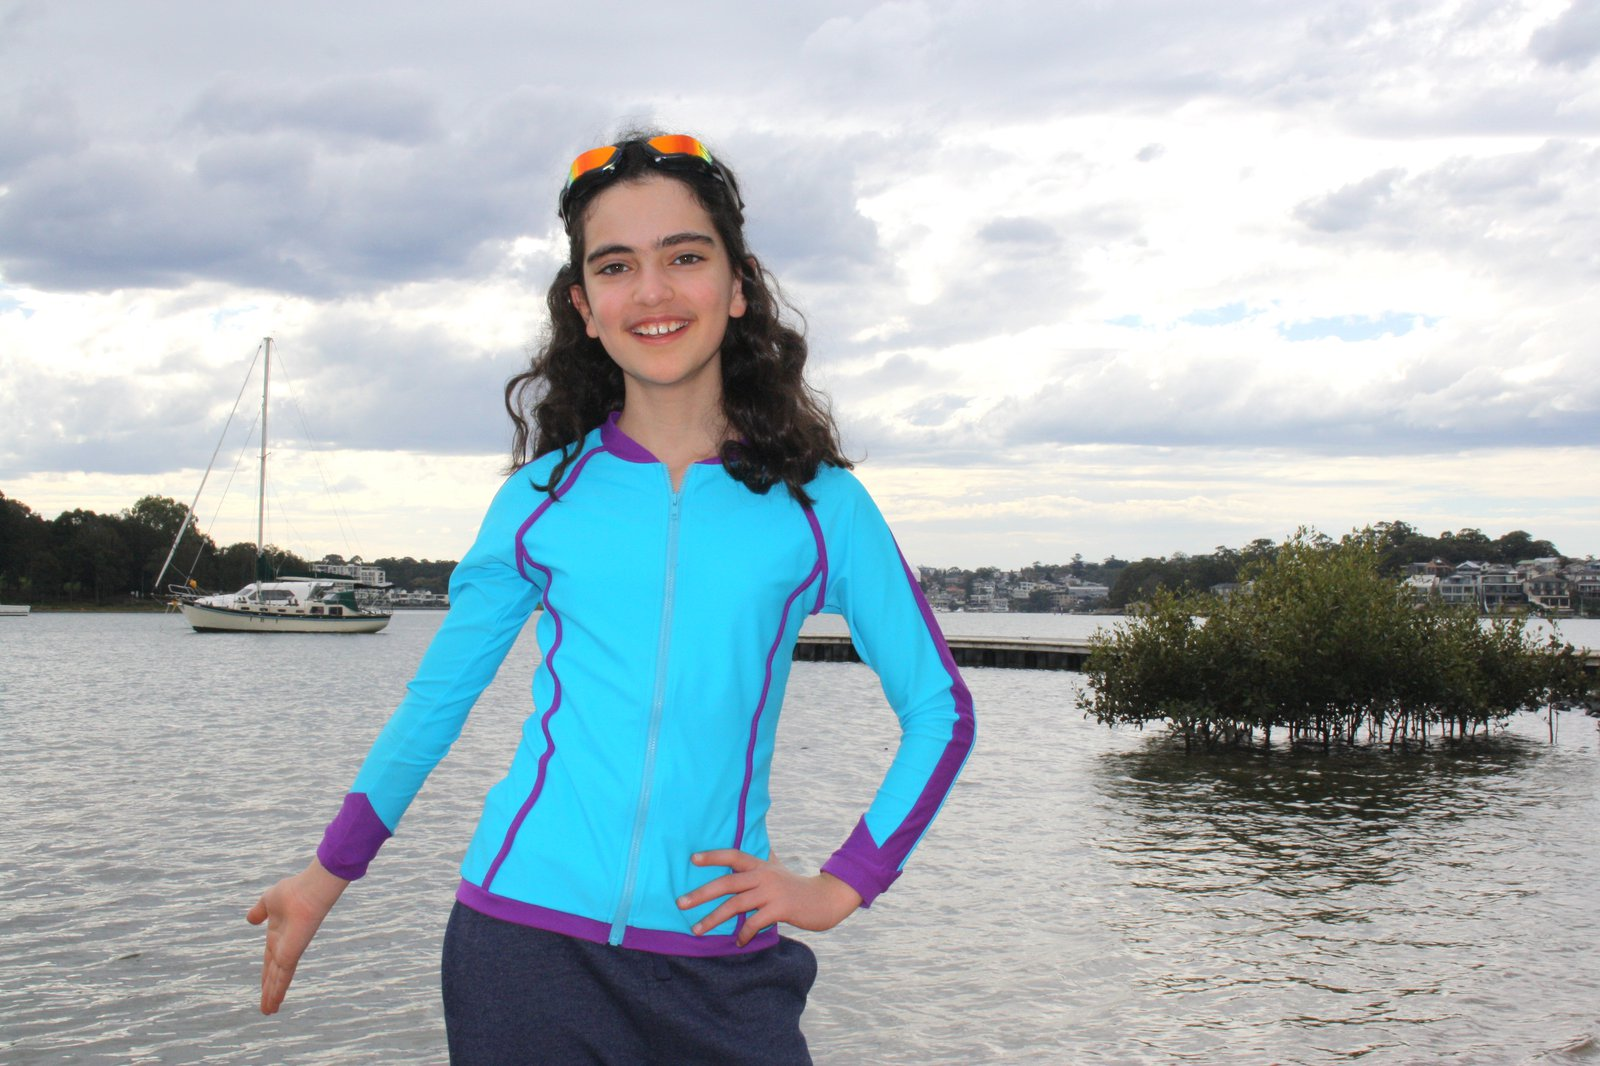 Zara M. - Finalist, 2021 University of Sydney Sleek Geeks Science Eureka Prize — Primary